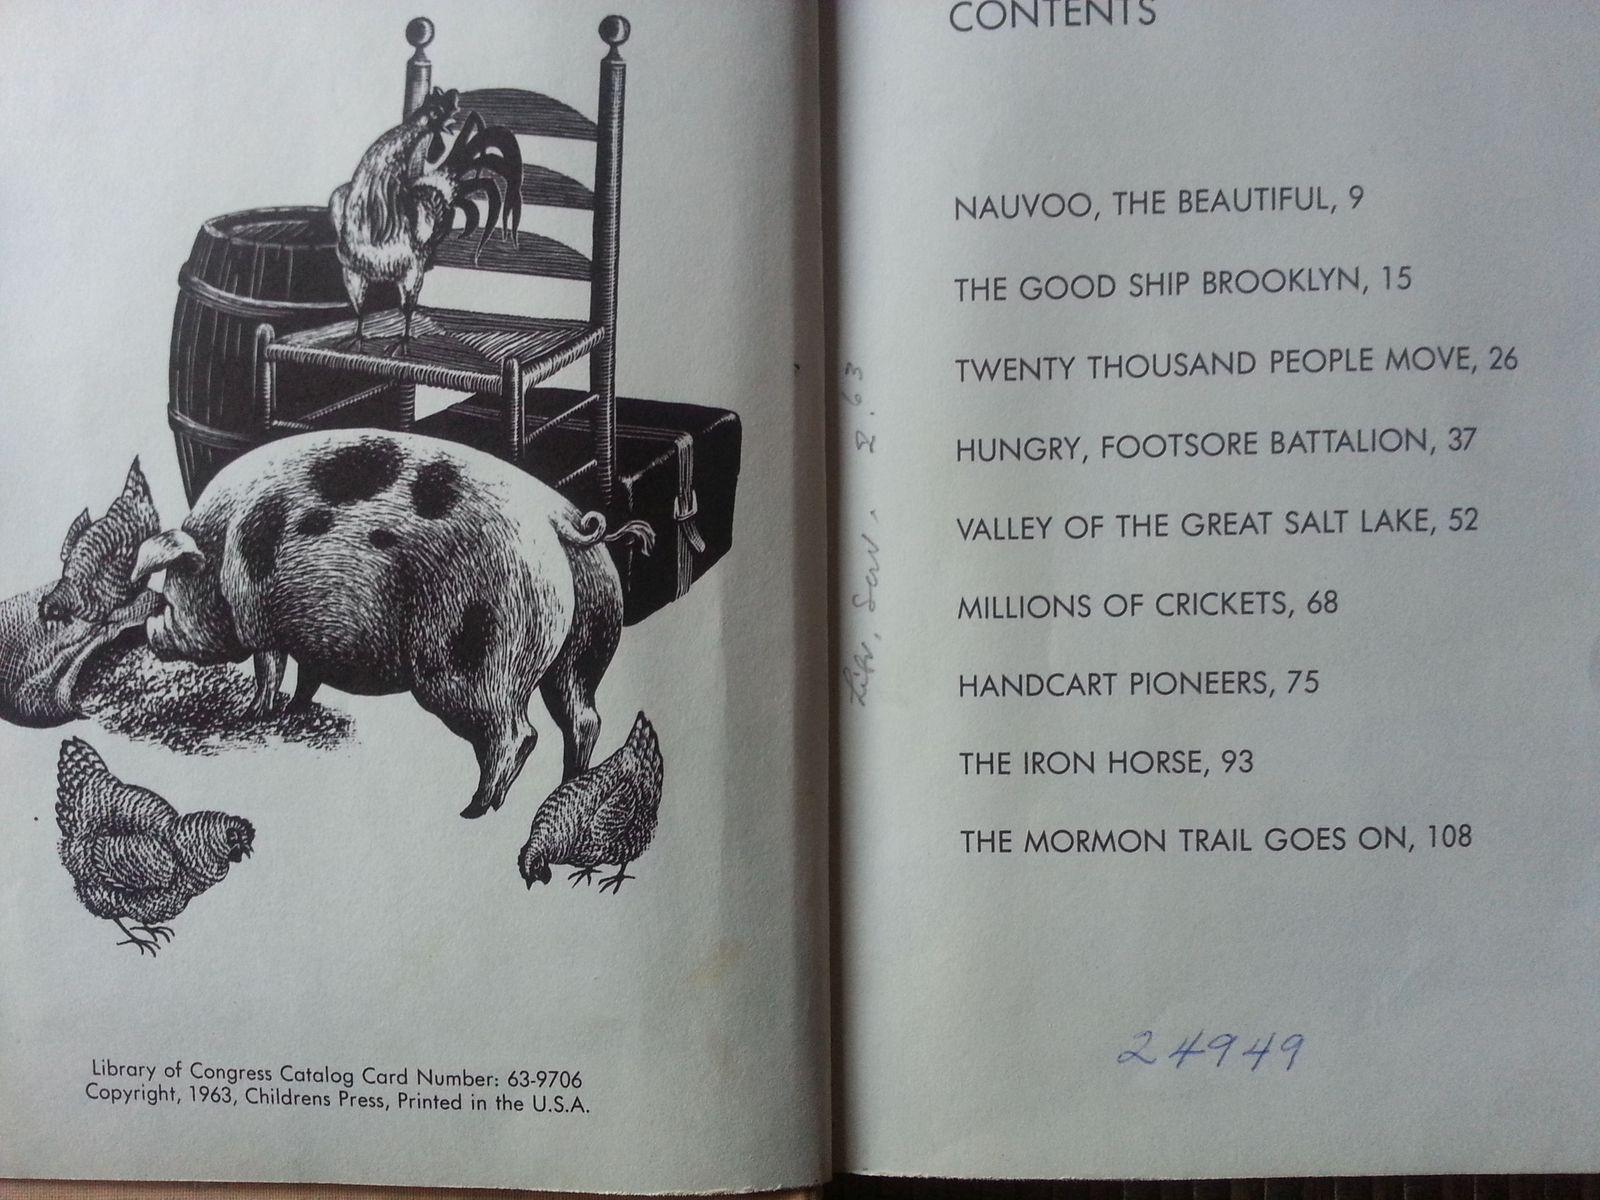 Over the Morman Trail by Helen Hinckley Jones 1963 HB